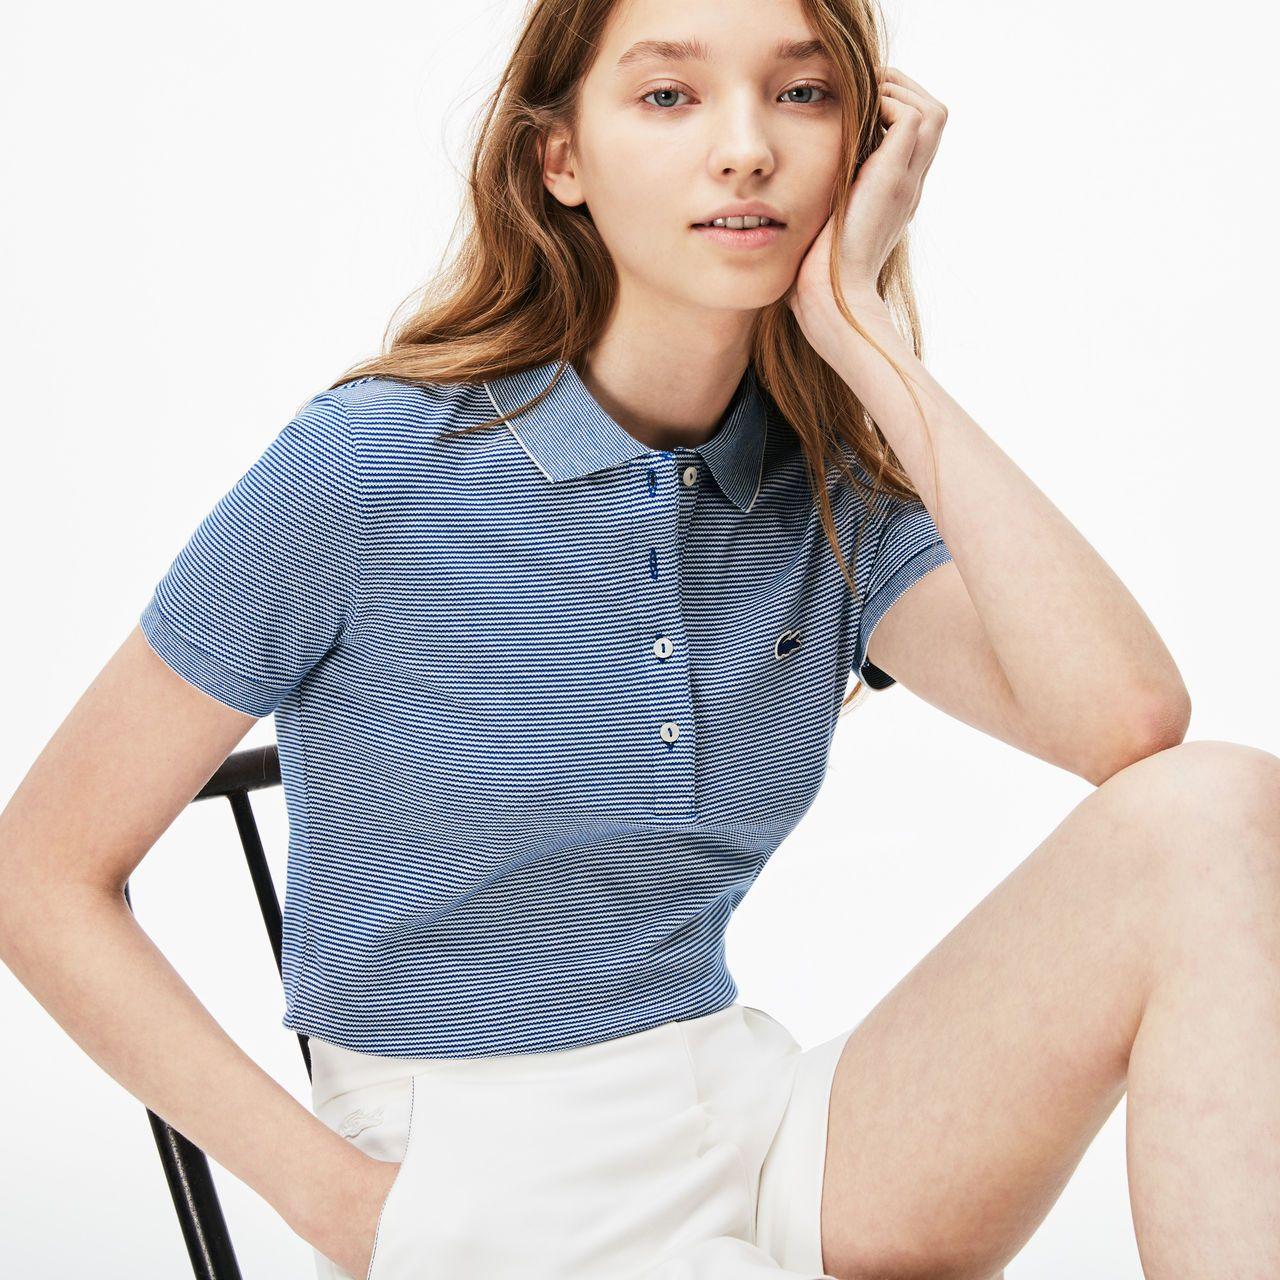 a06498d9 Women's Slim Fit Pinstriped Piqué Polo   LACOSTE   walk walk fashion ...